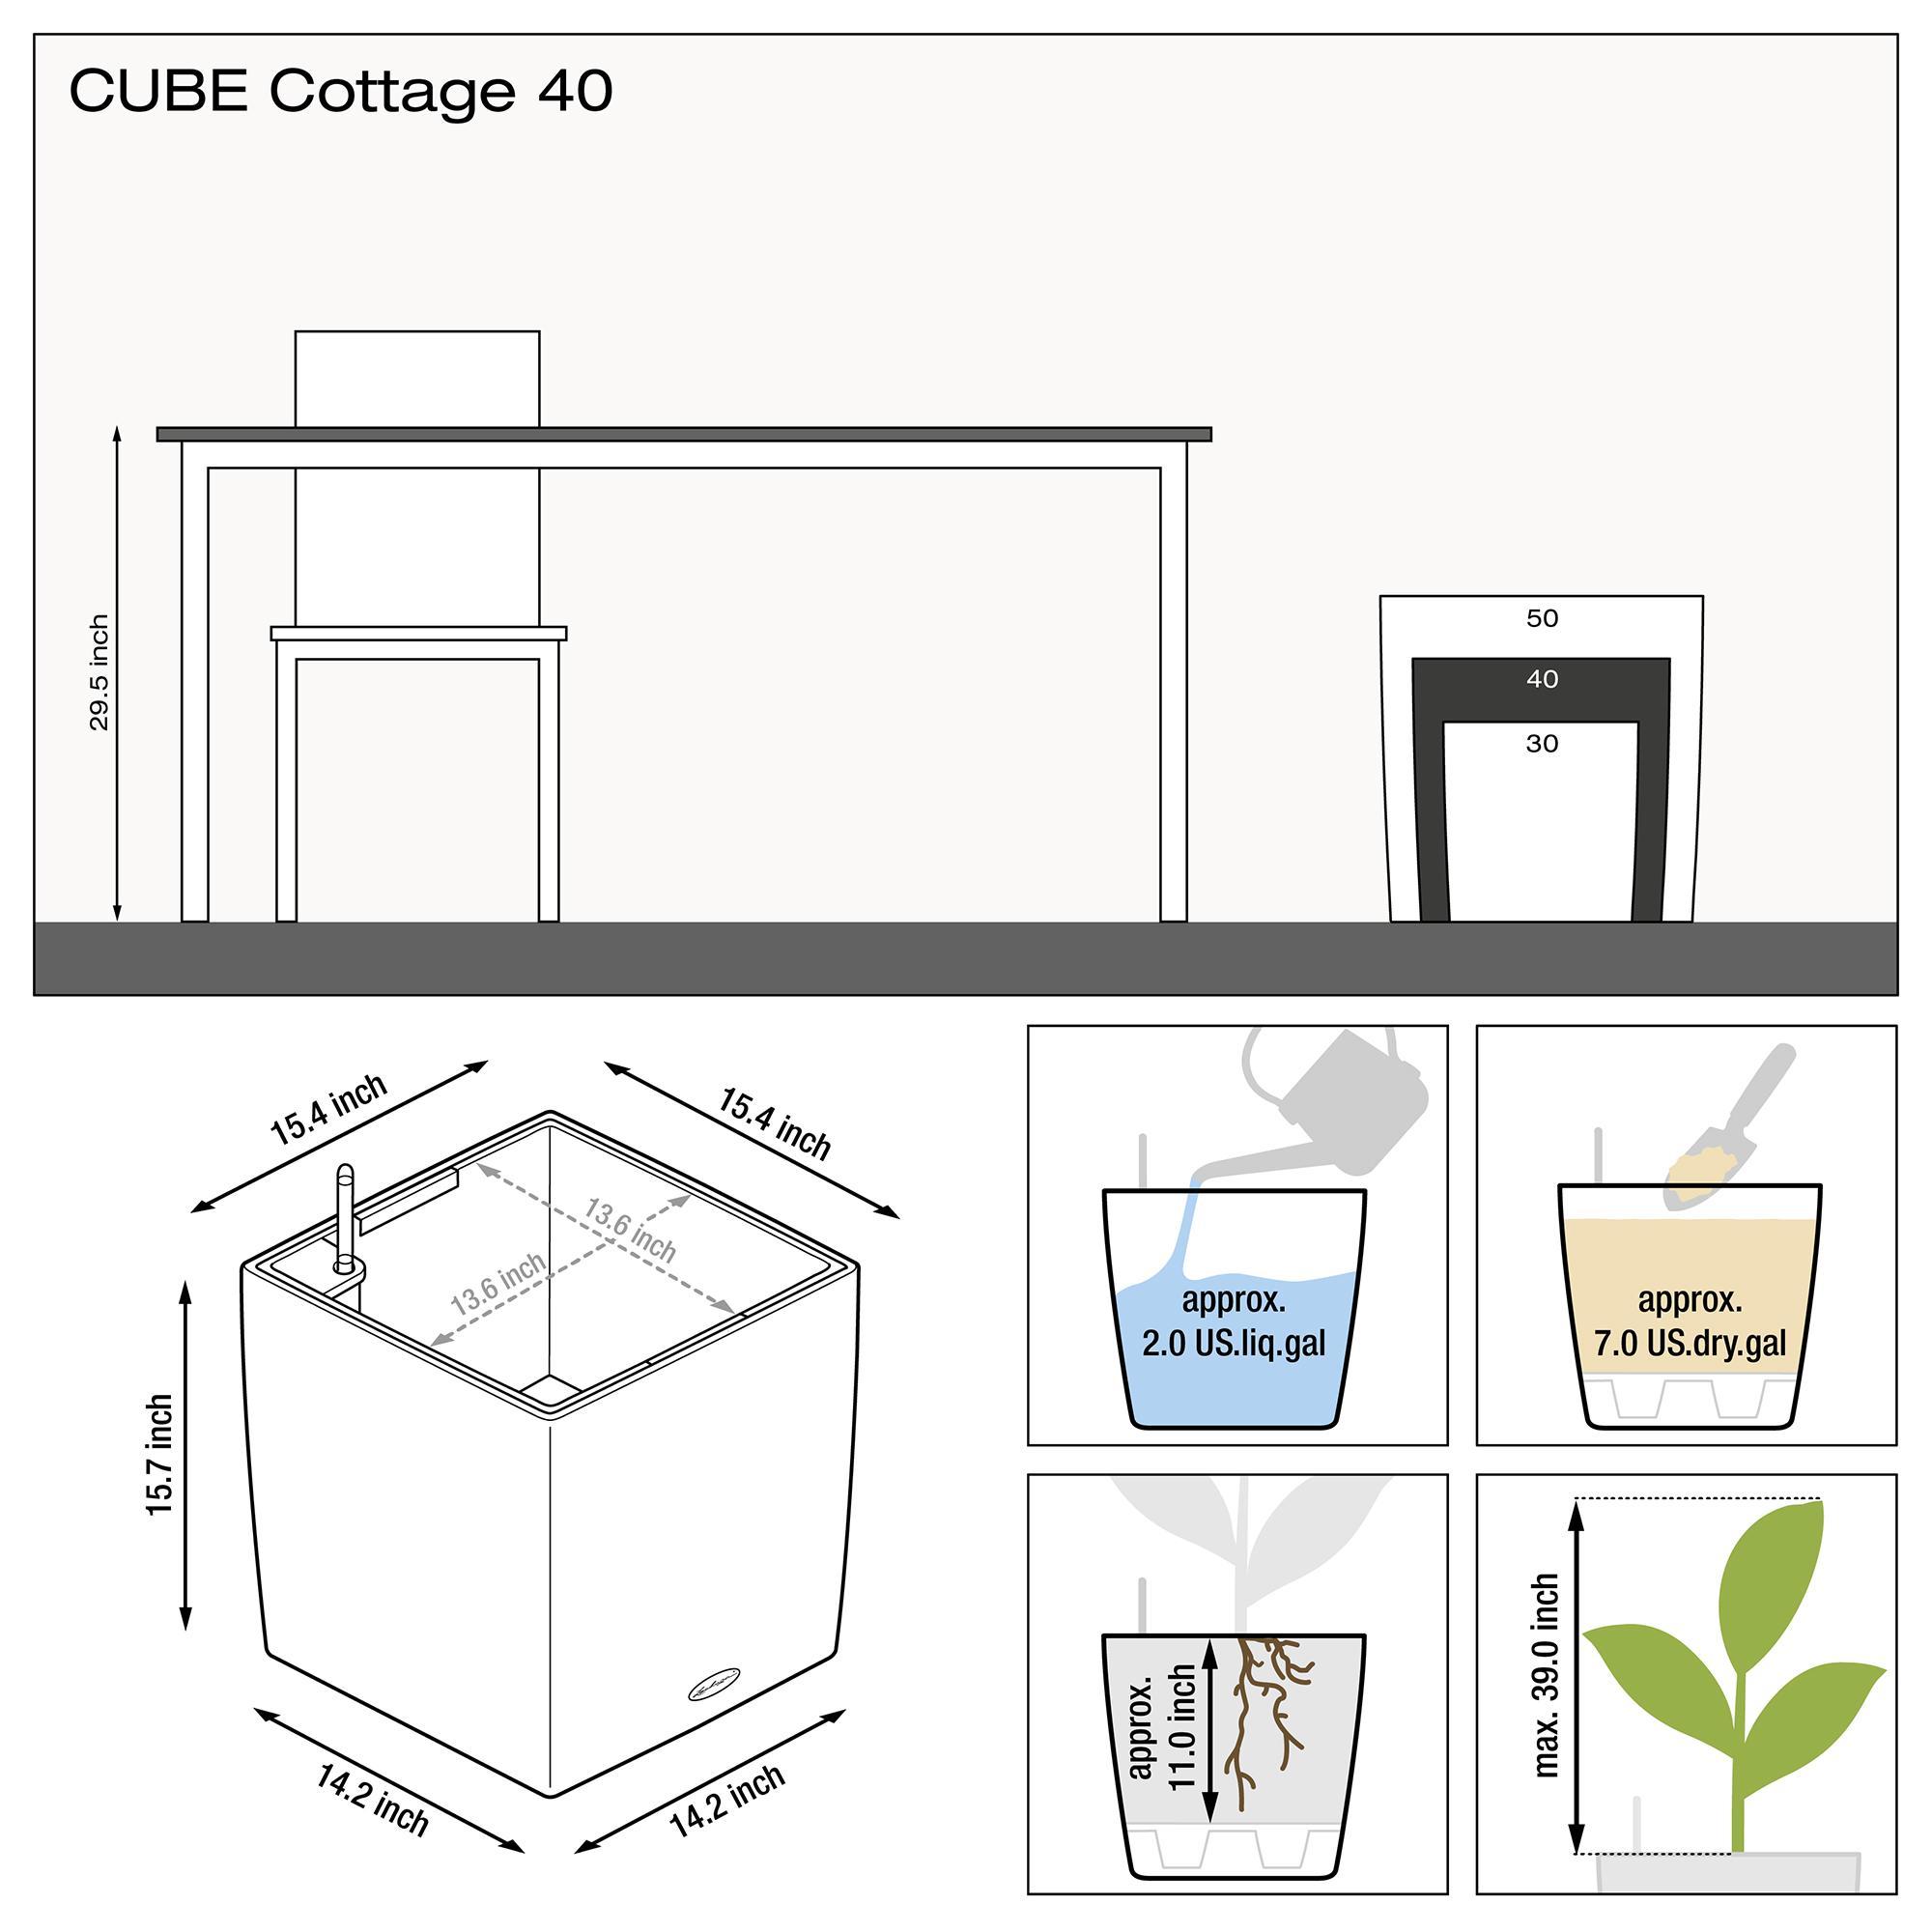 le_cube-cottage40_product_addi_nz_us